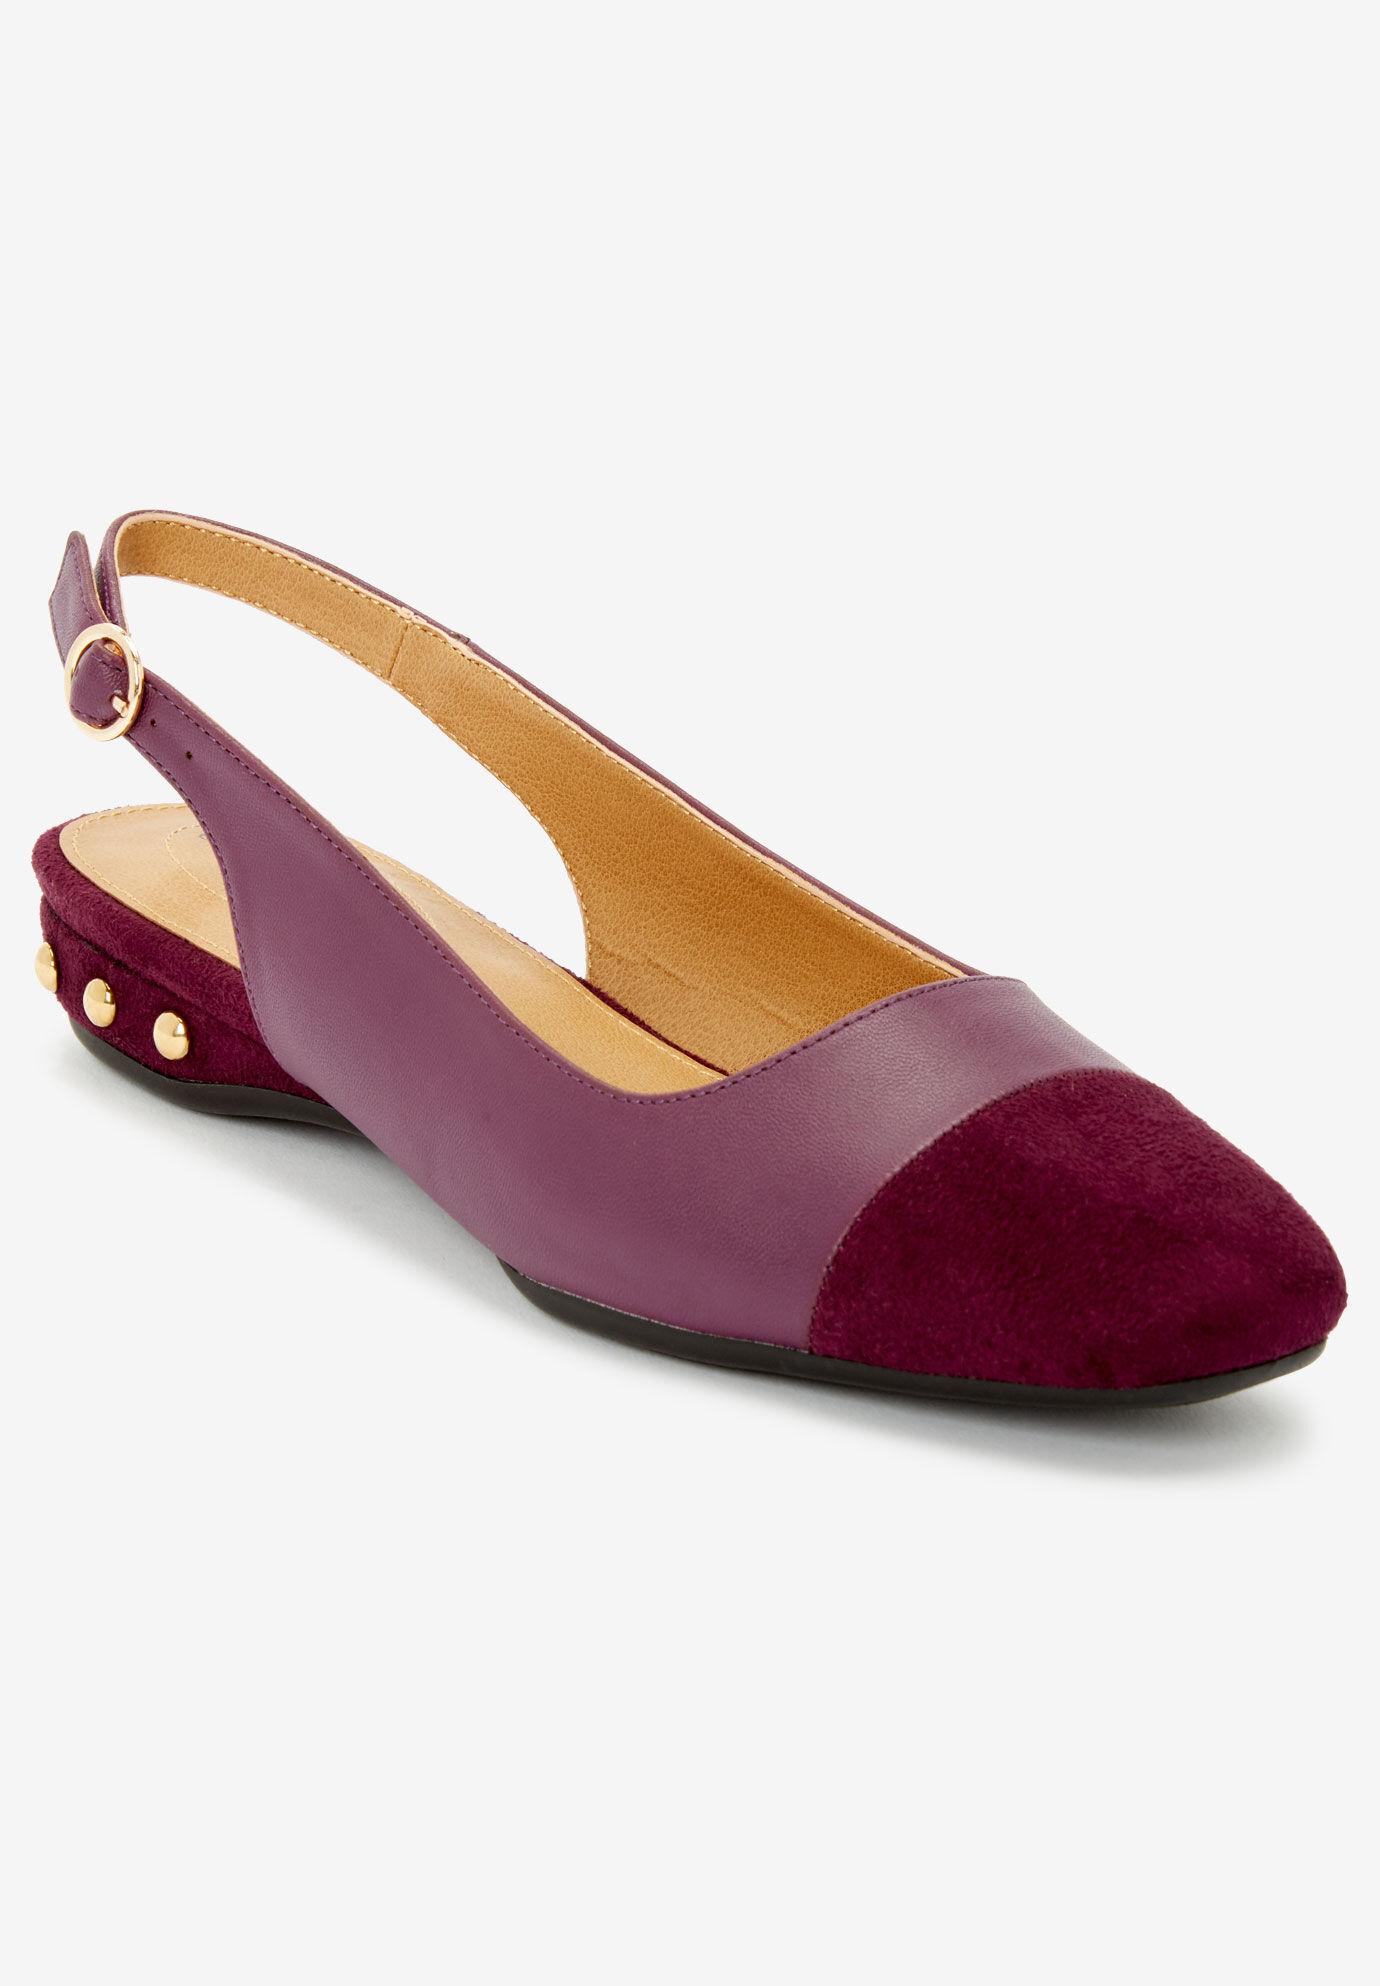 Women's Wide Width Shoes \u0026 Boot Shop